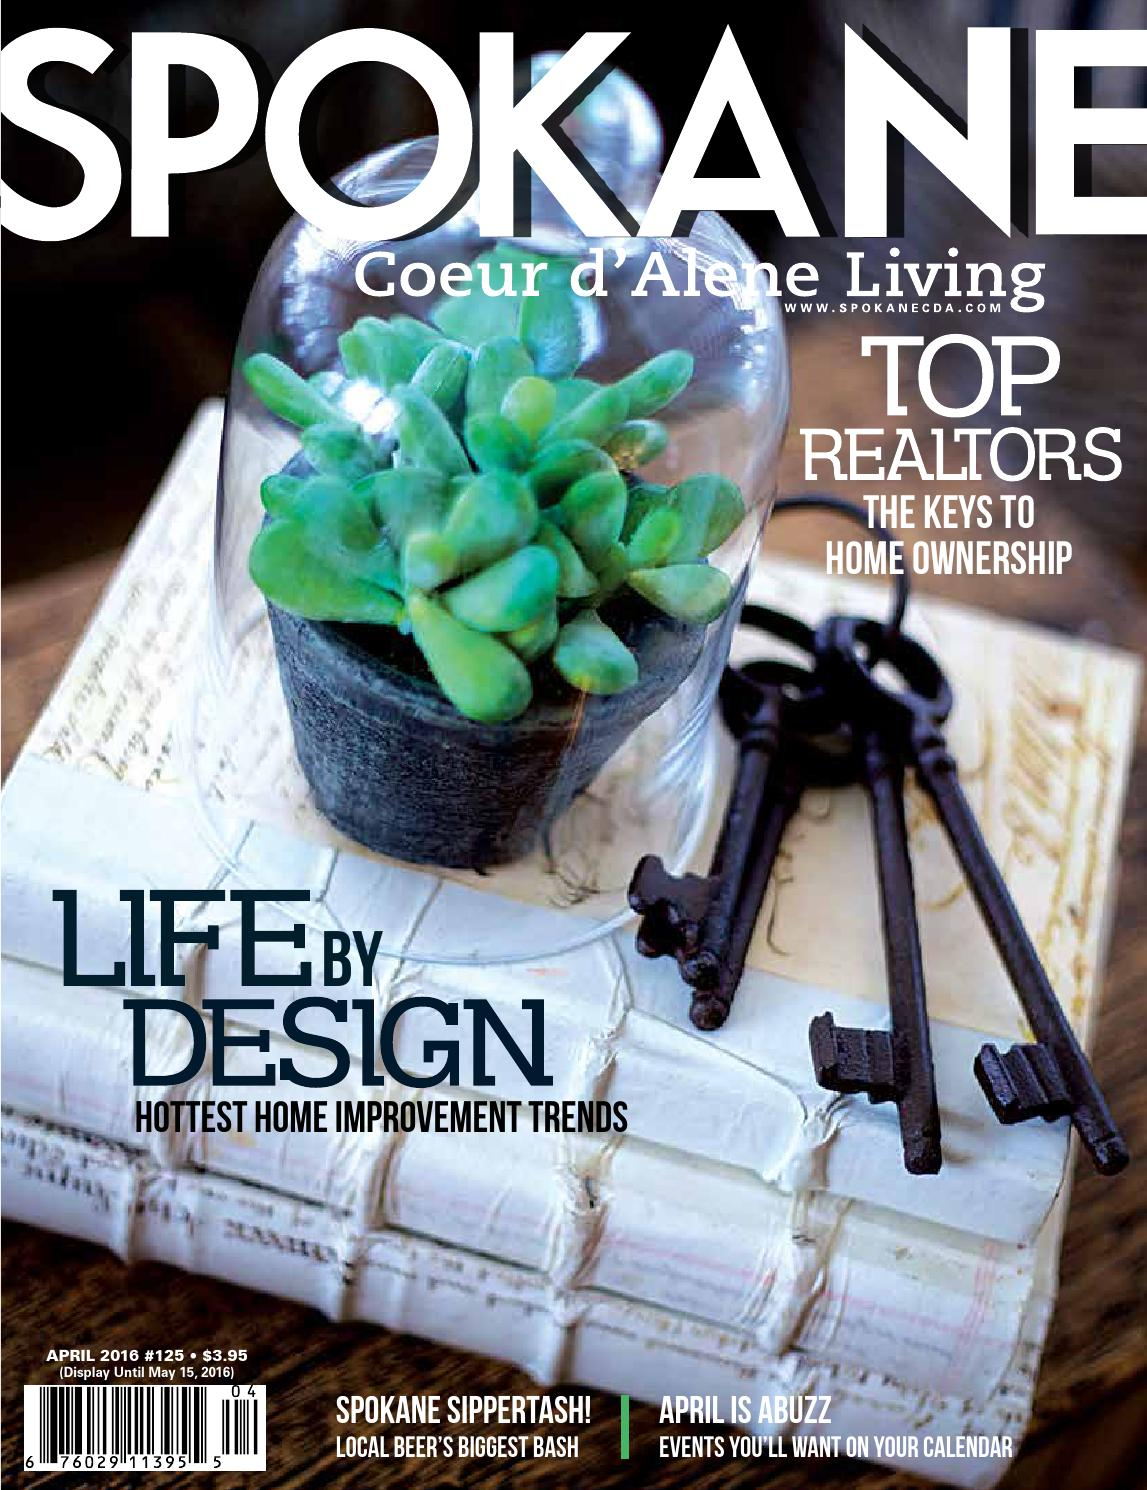 Spokane CDA Living April 2016 Issue 125 by Spokane magazine - issuu